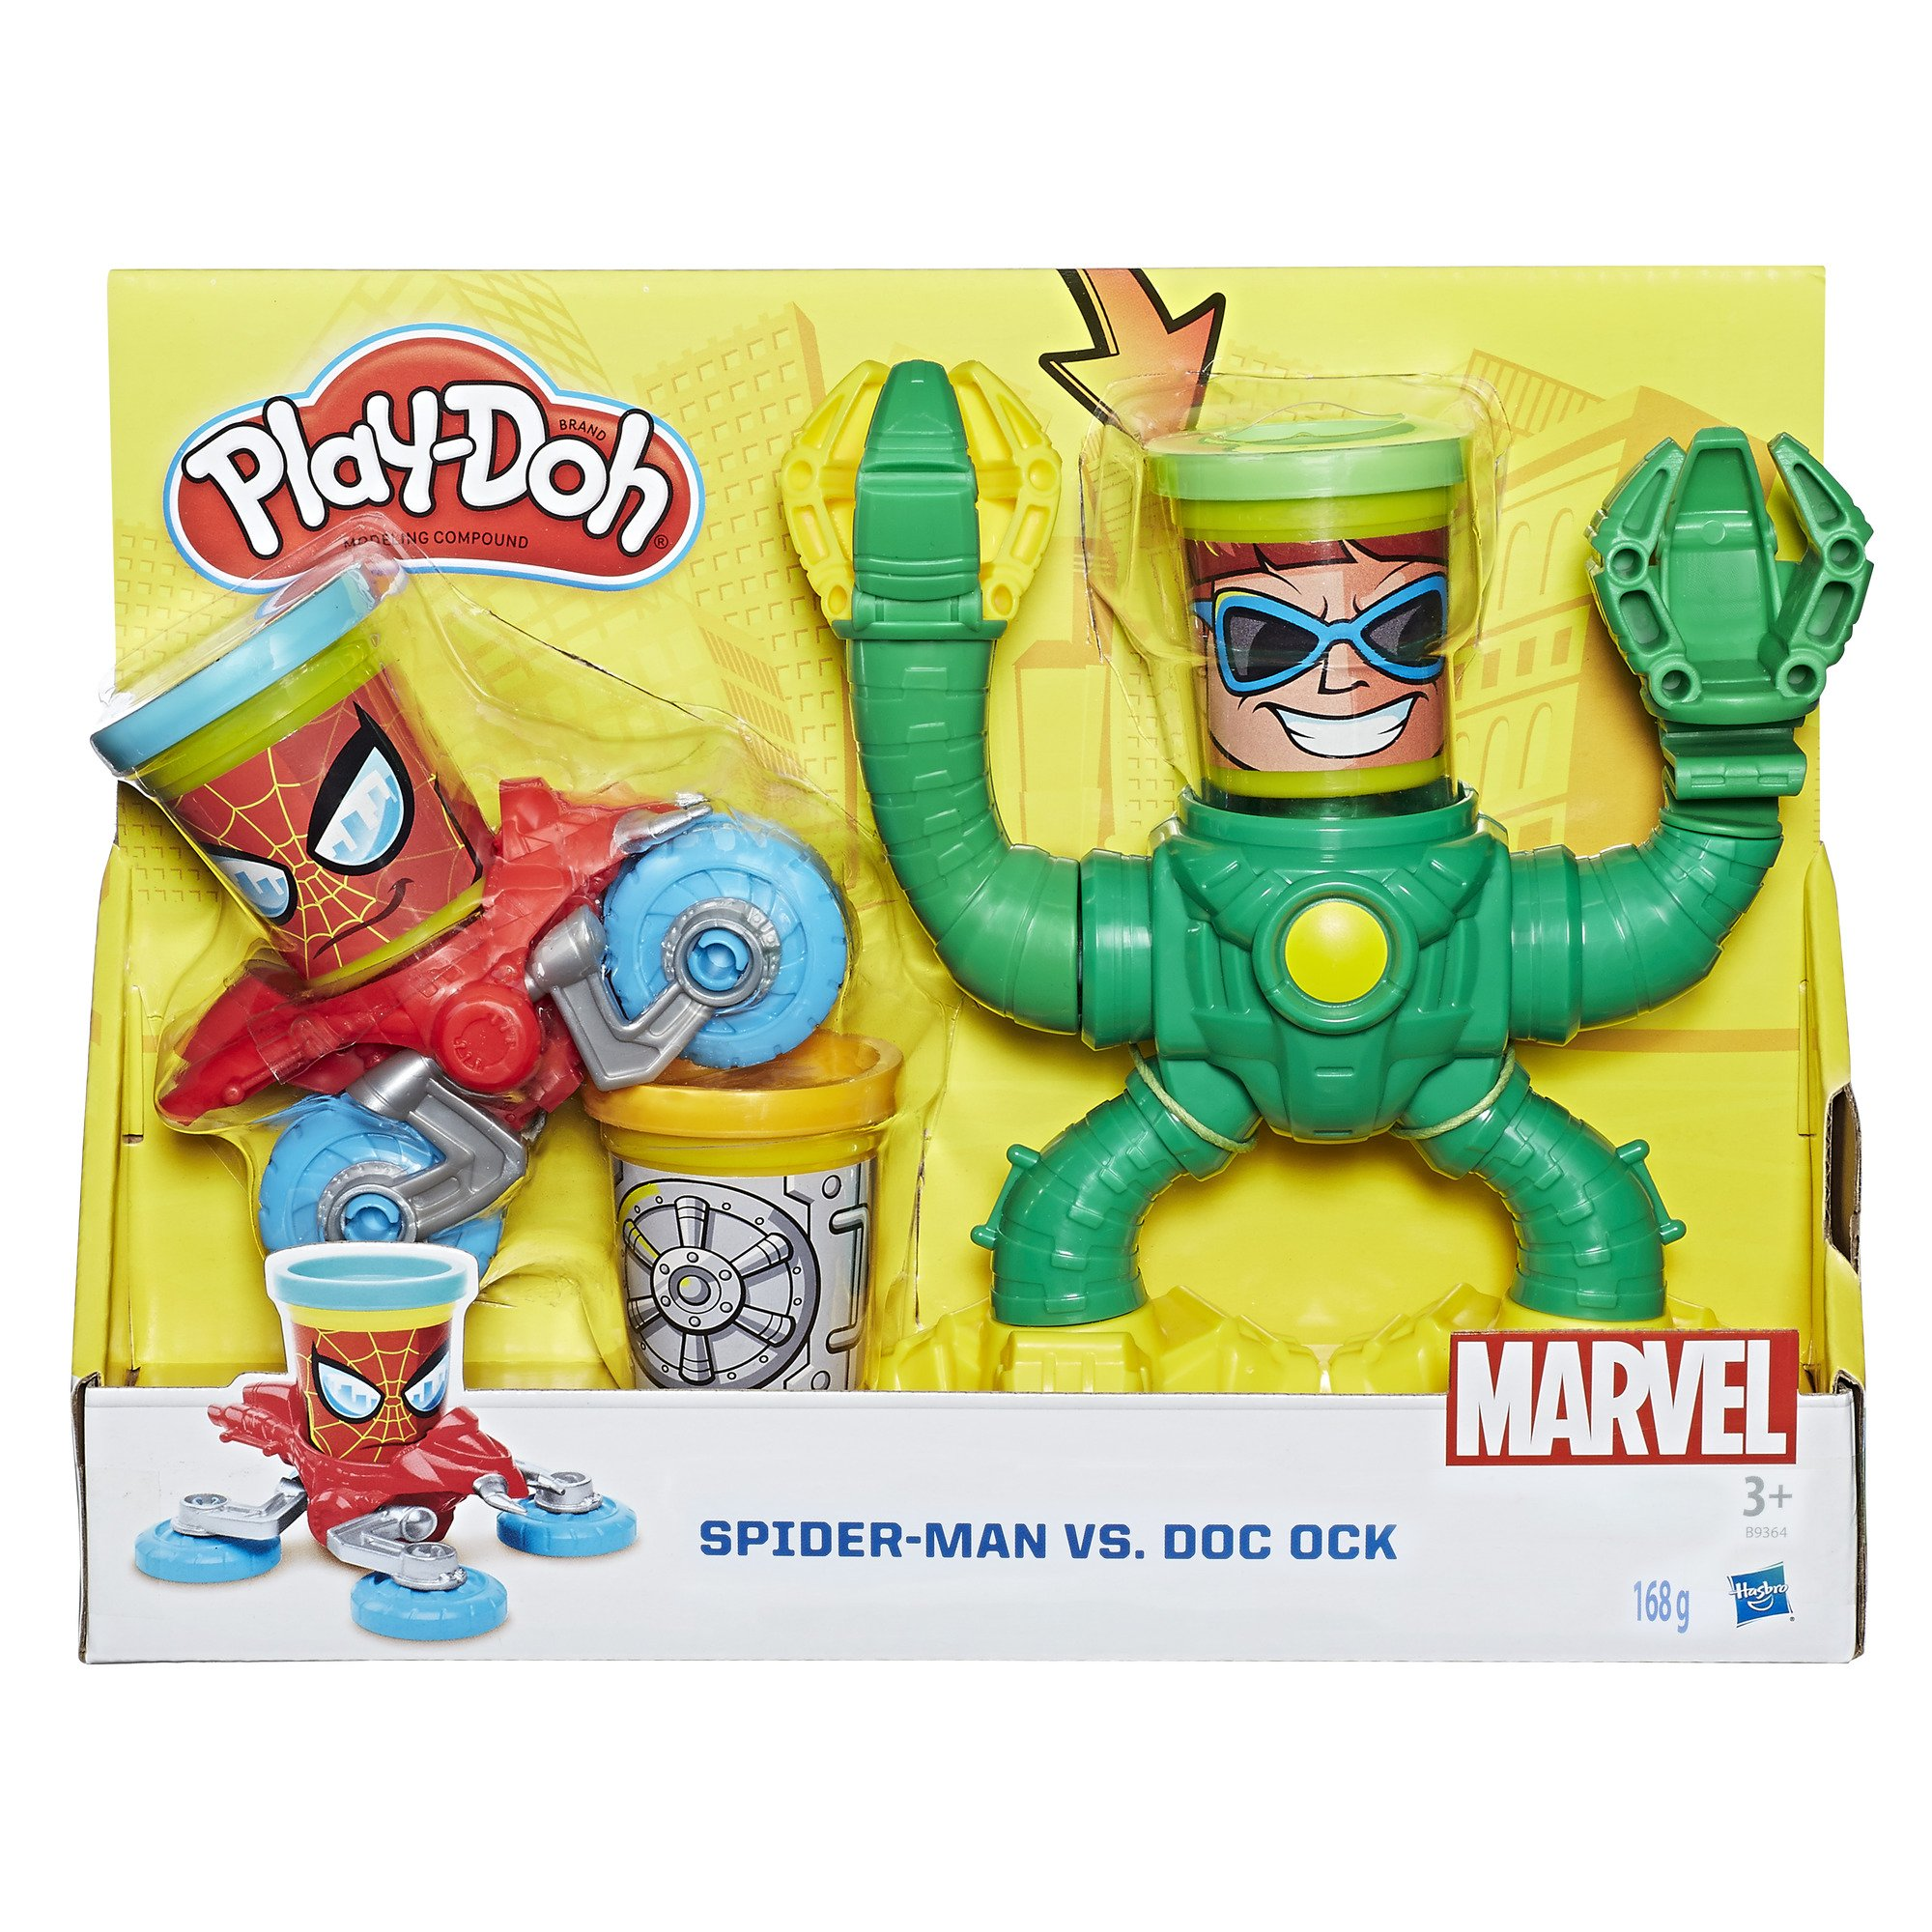 Play-Doh B9364EU5 Marvel Spider-Man vs Doc Ock Dough by Play-Doh